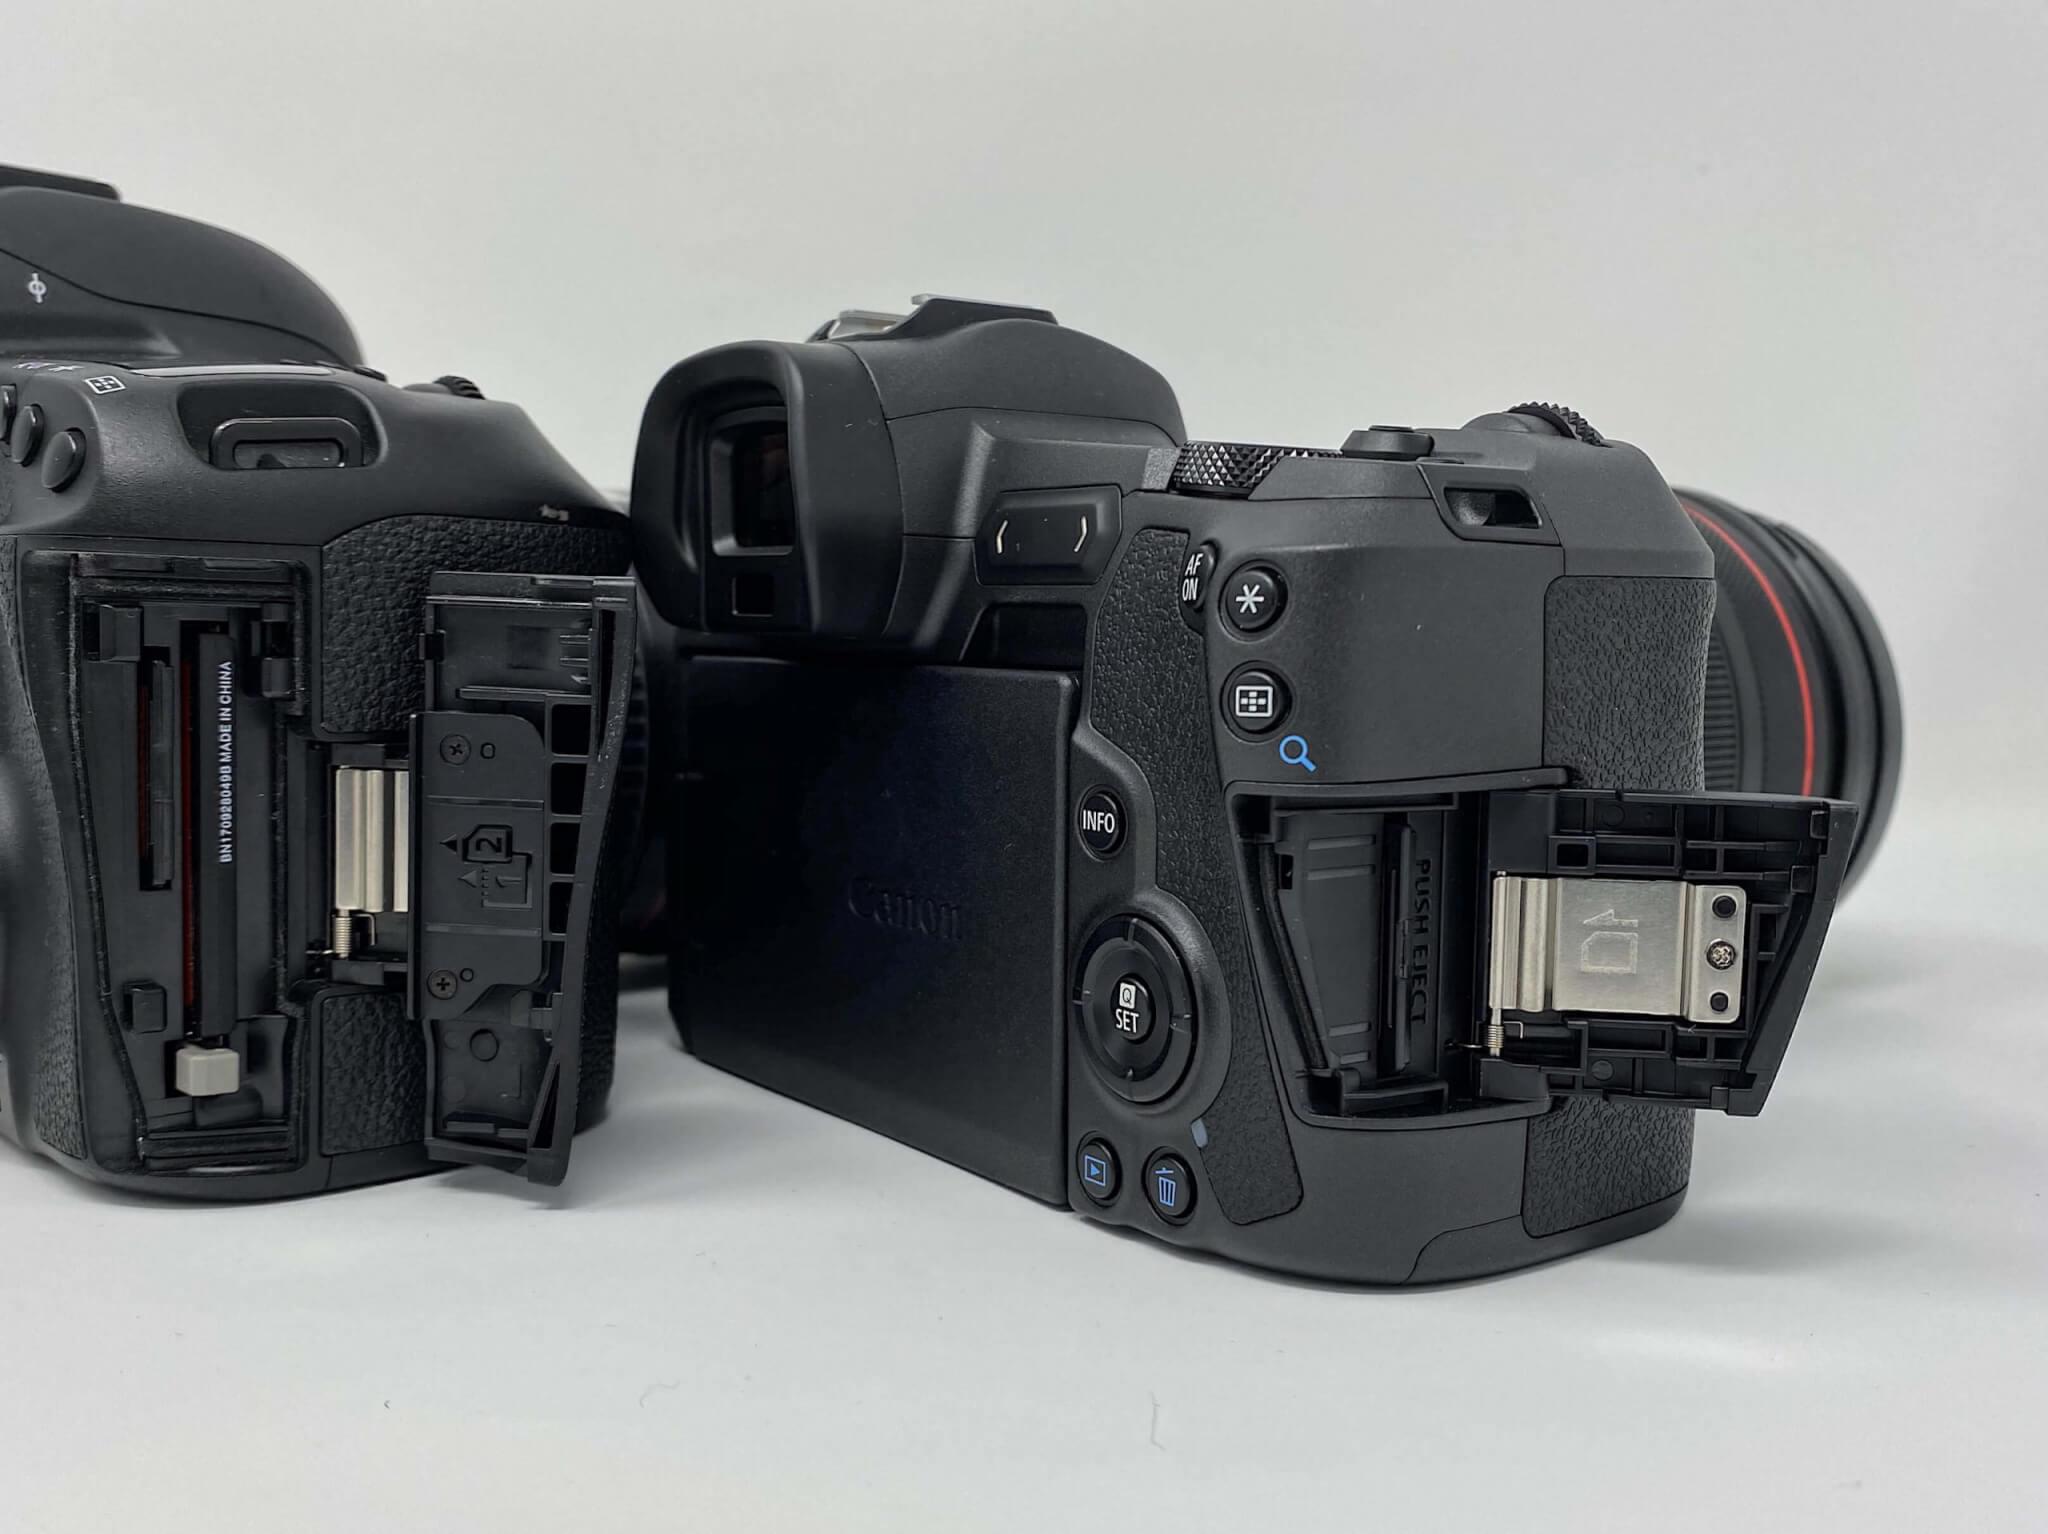 Vergleich: Canon EOS R und Canon EOS 5D MK IV